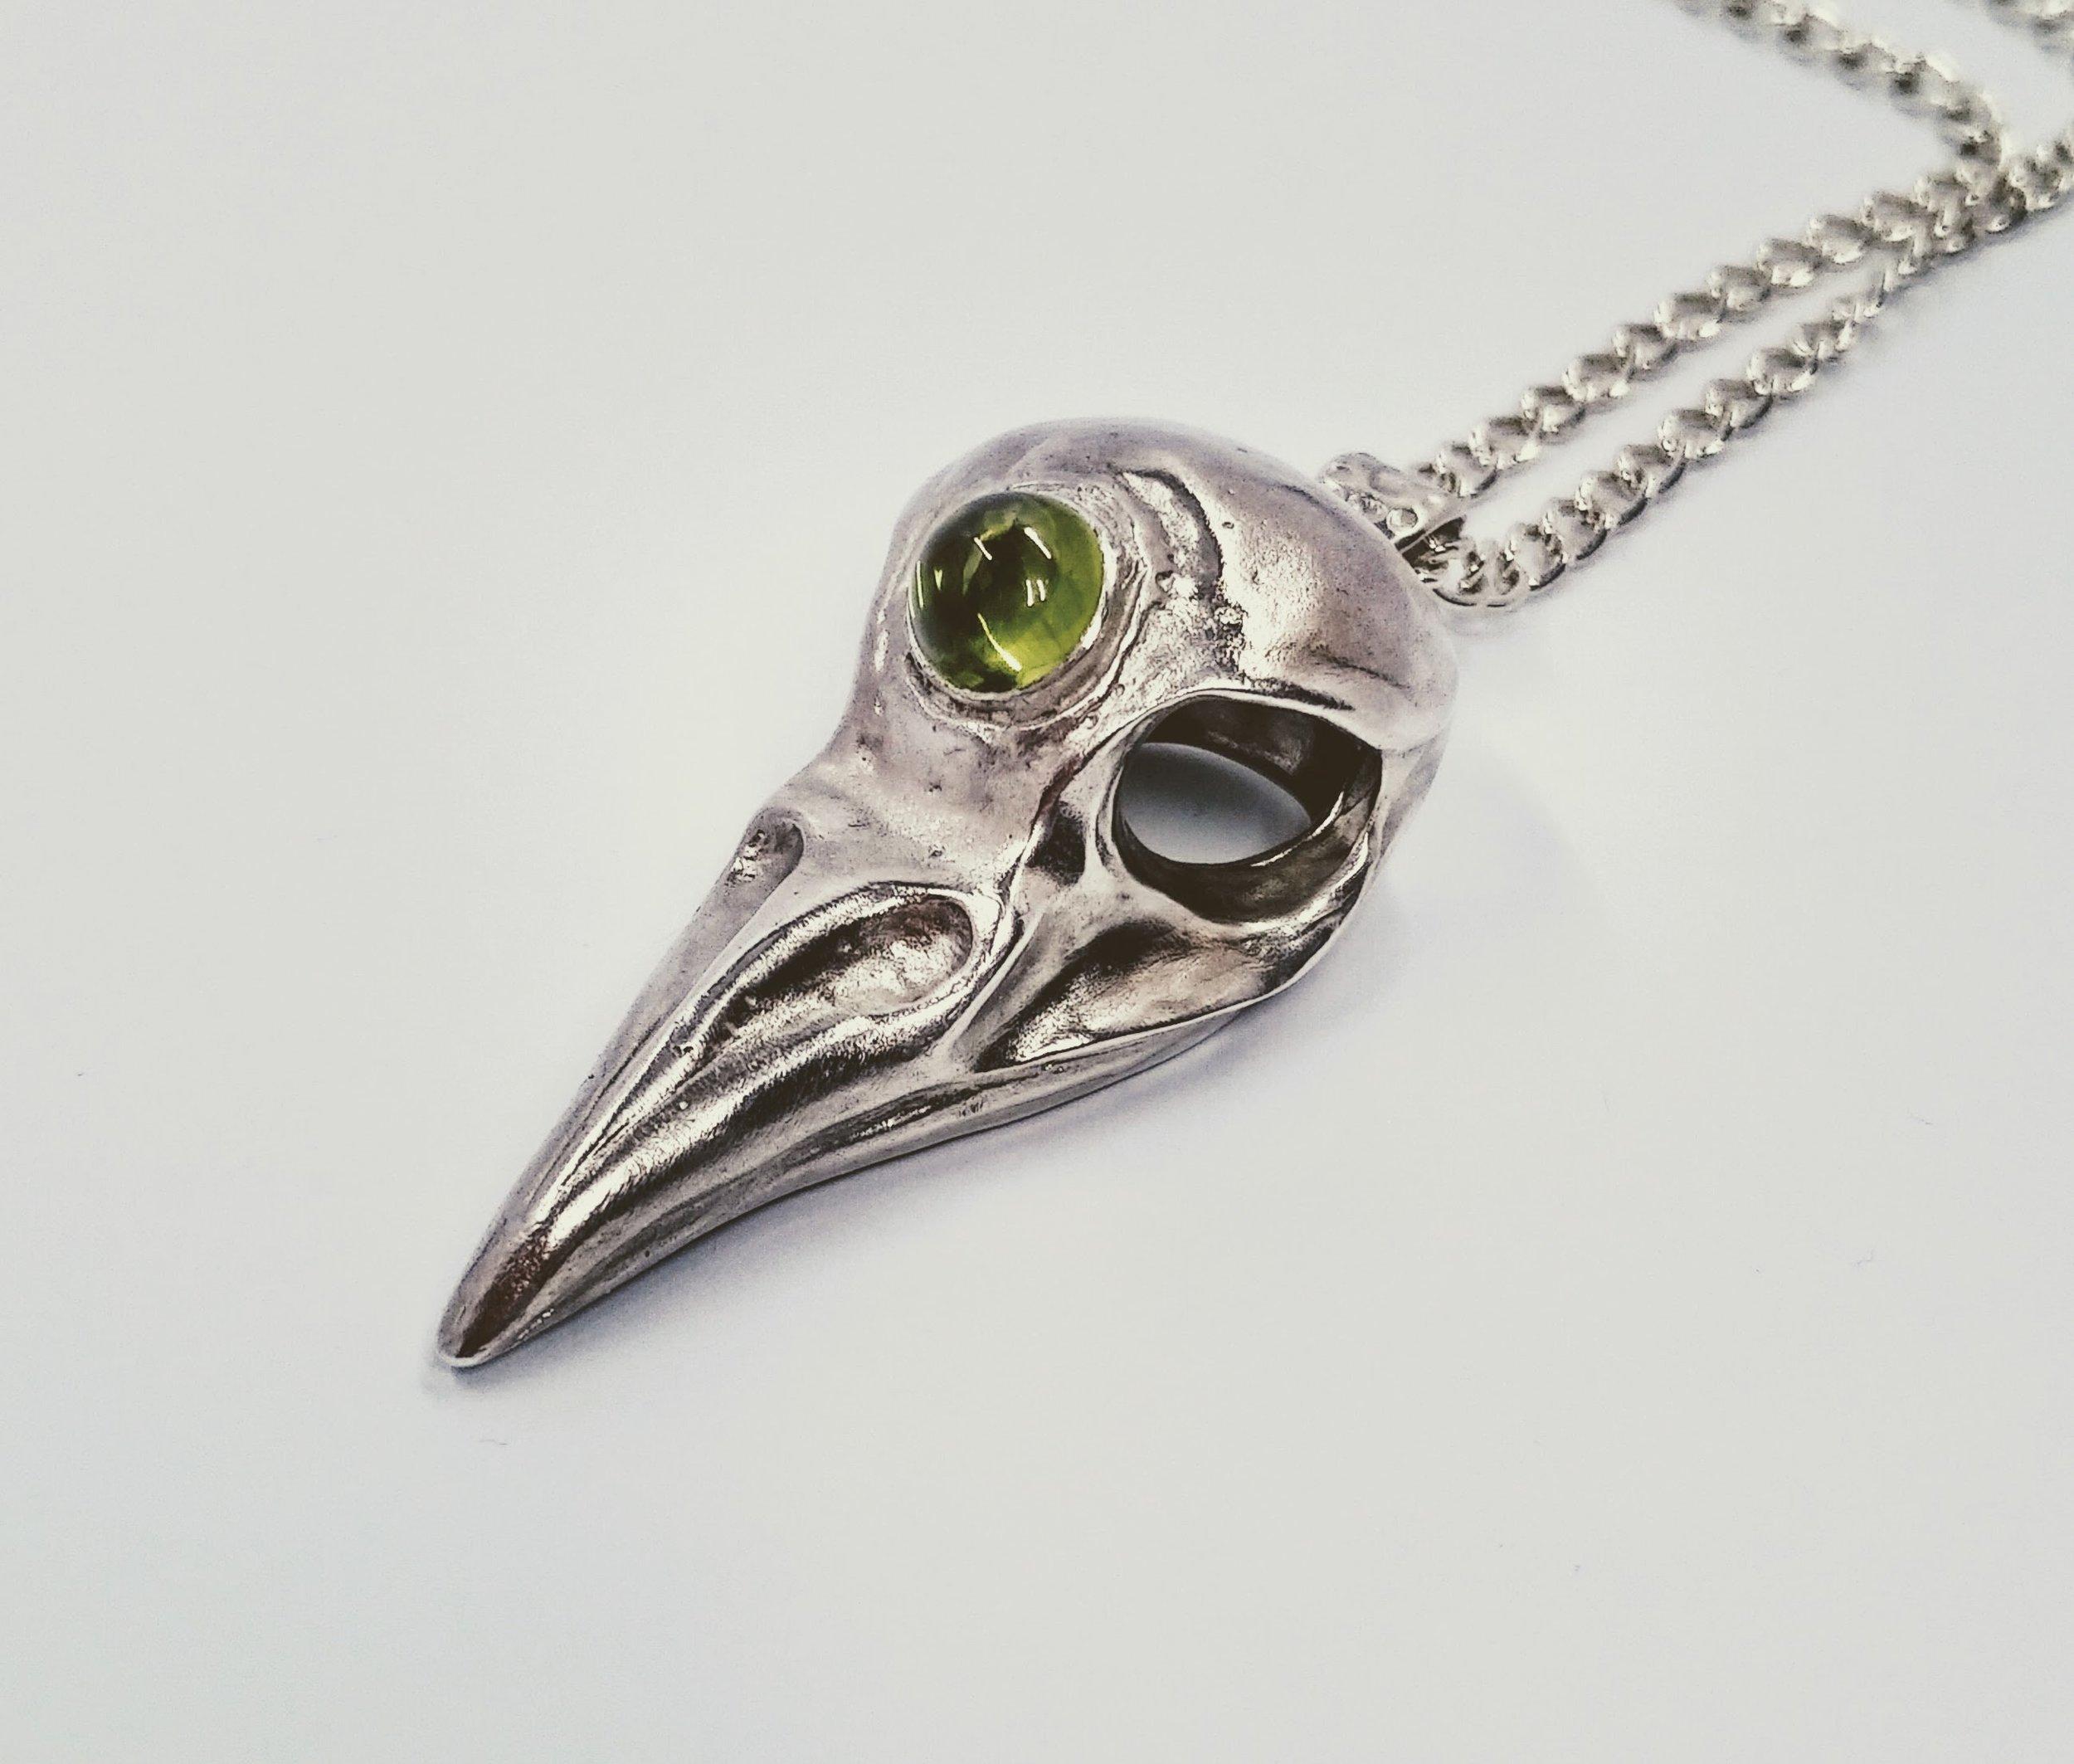 Three-eyed raven skull pendant with peridot -  BUY